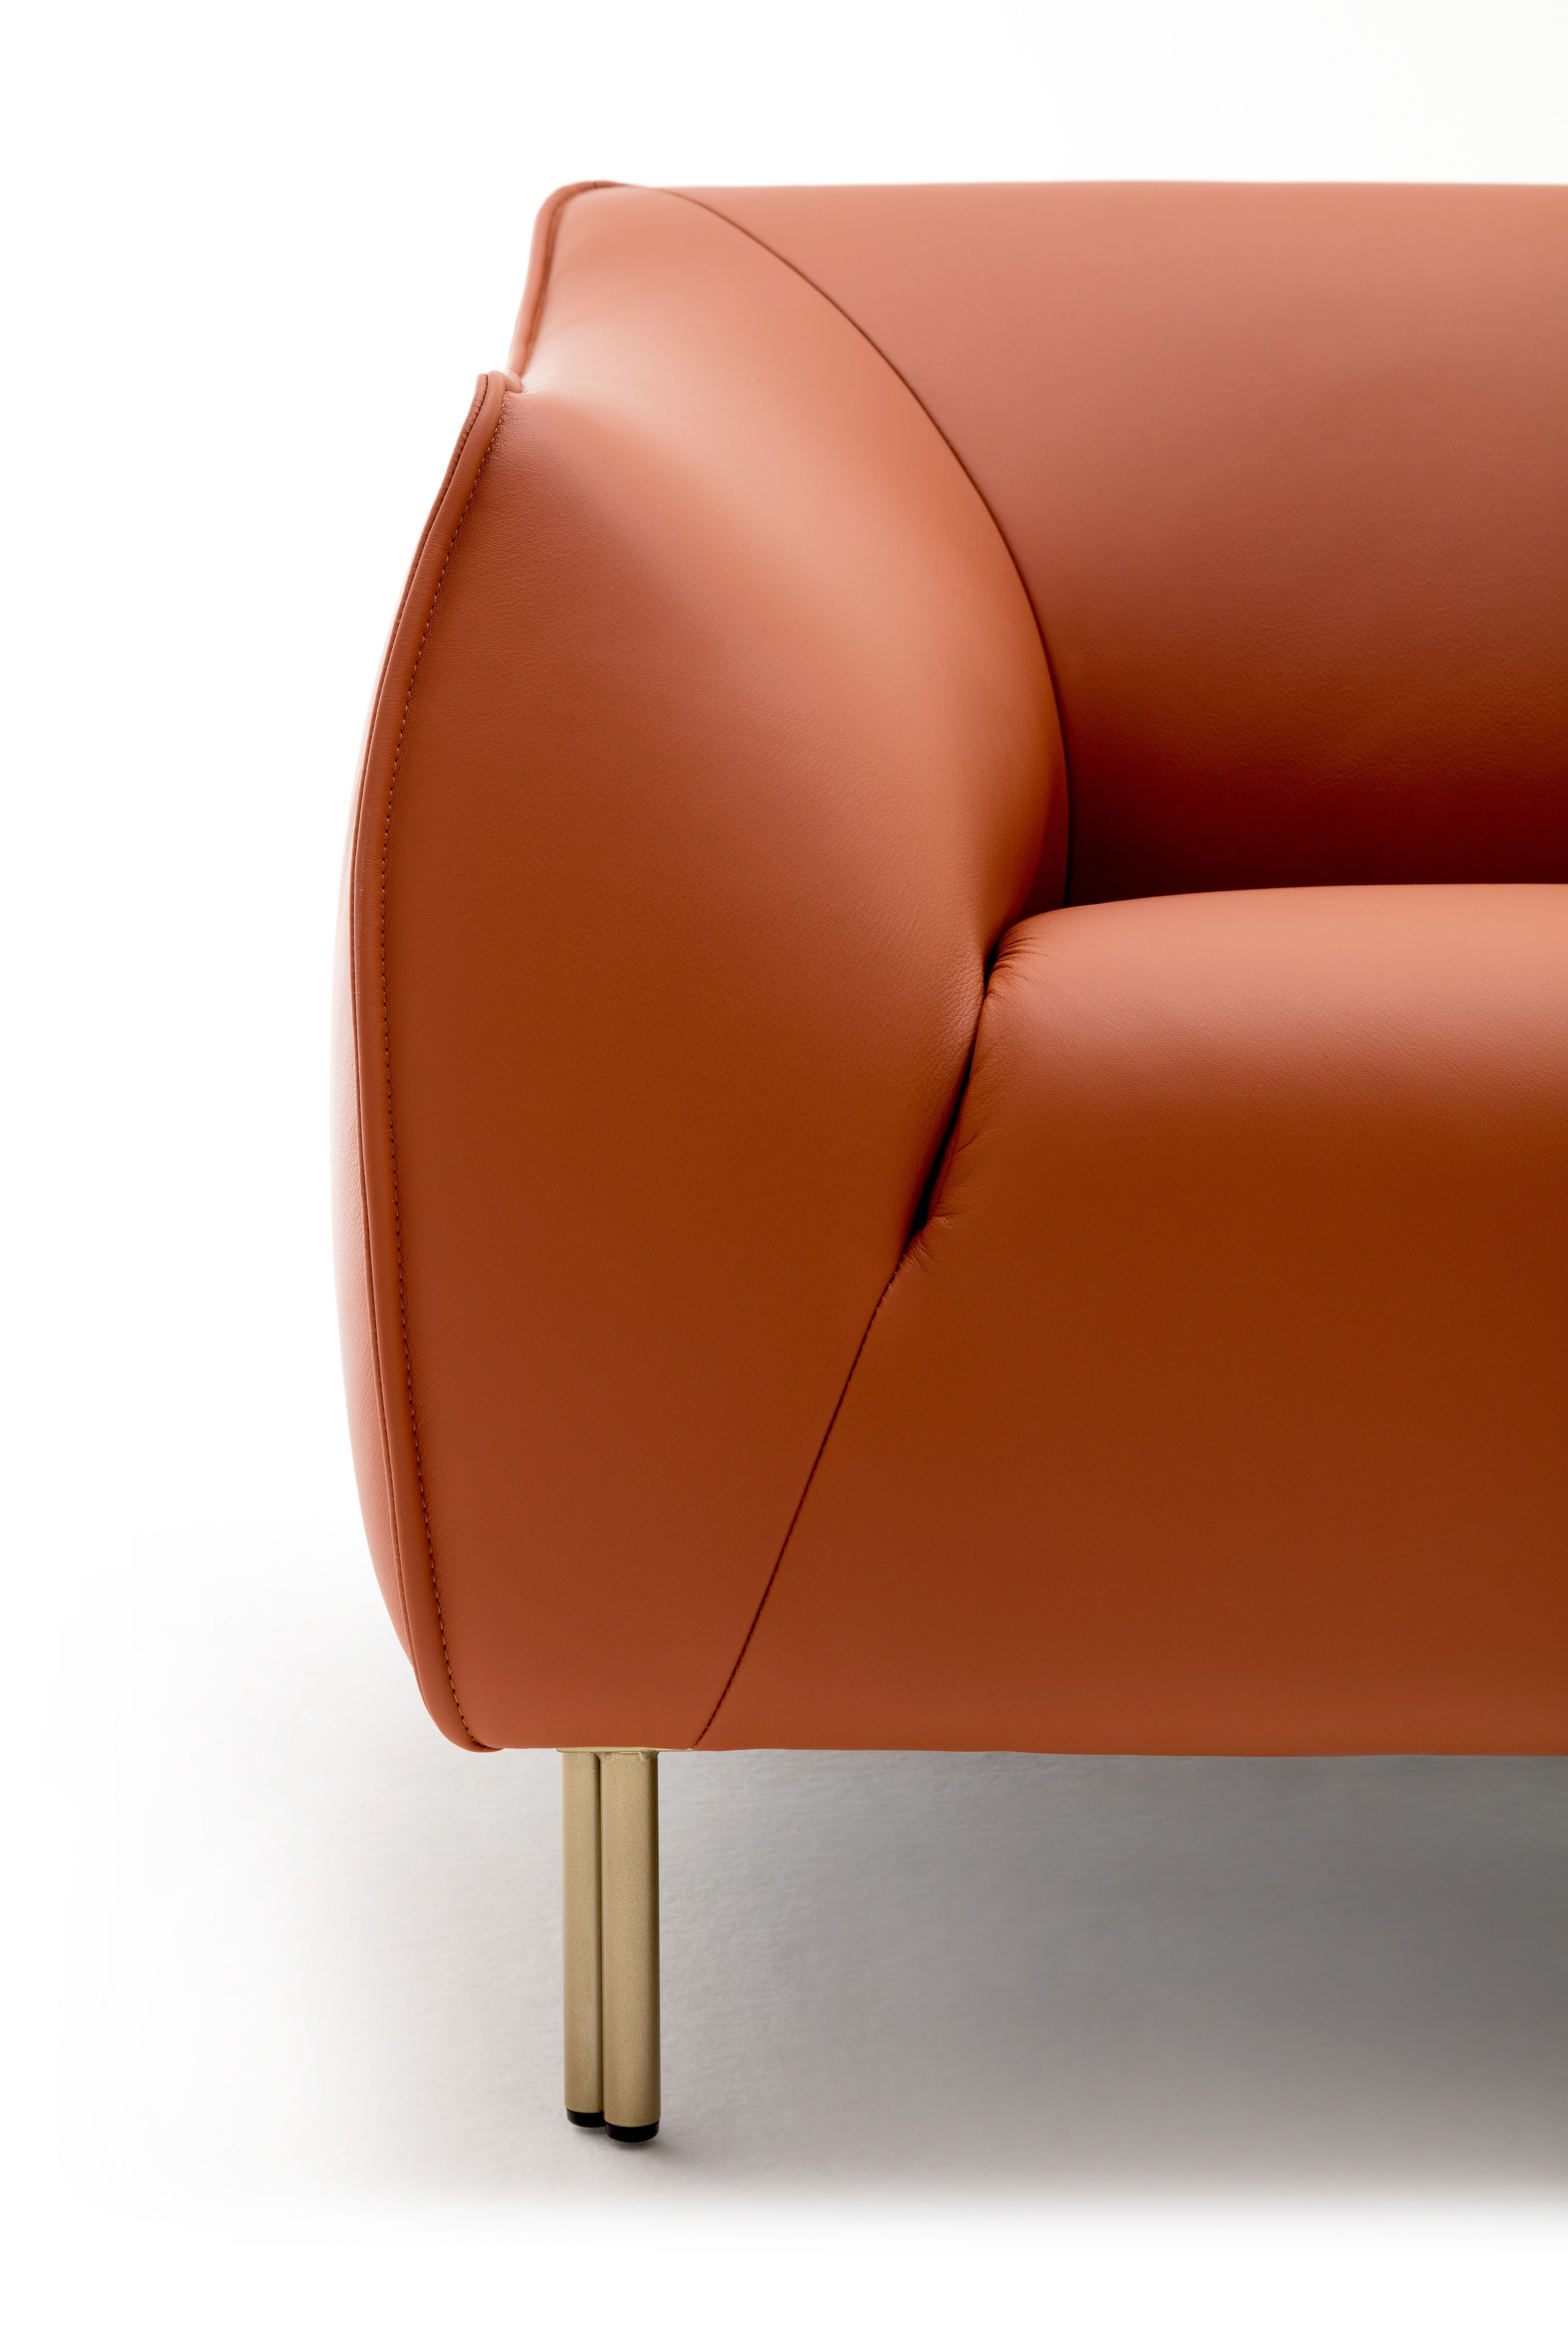 studio anise rolf benz 50 sofa.  Sofa Studio Anise Rolf Benz 50 Sofa Sneak Peek At The New Freistil By To Studio Anise Rolf Benz Sofa